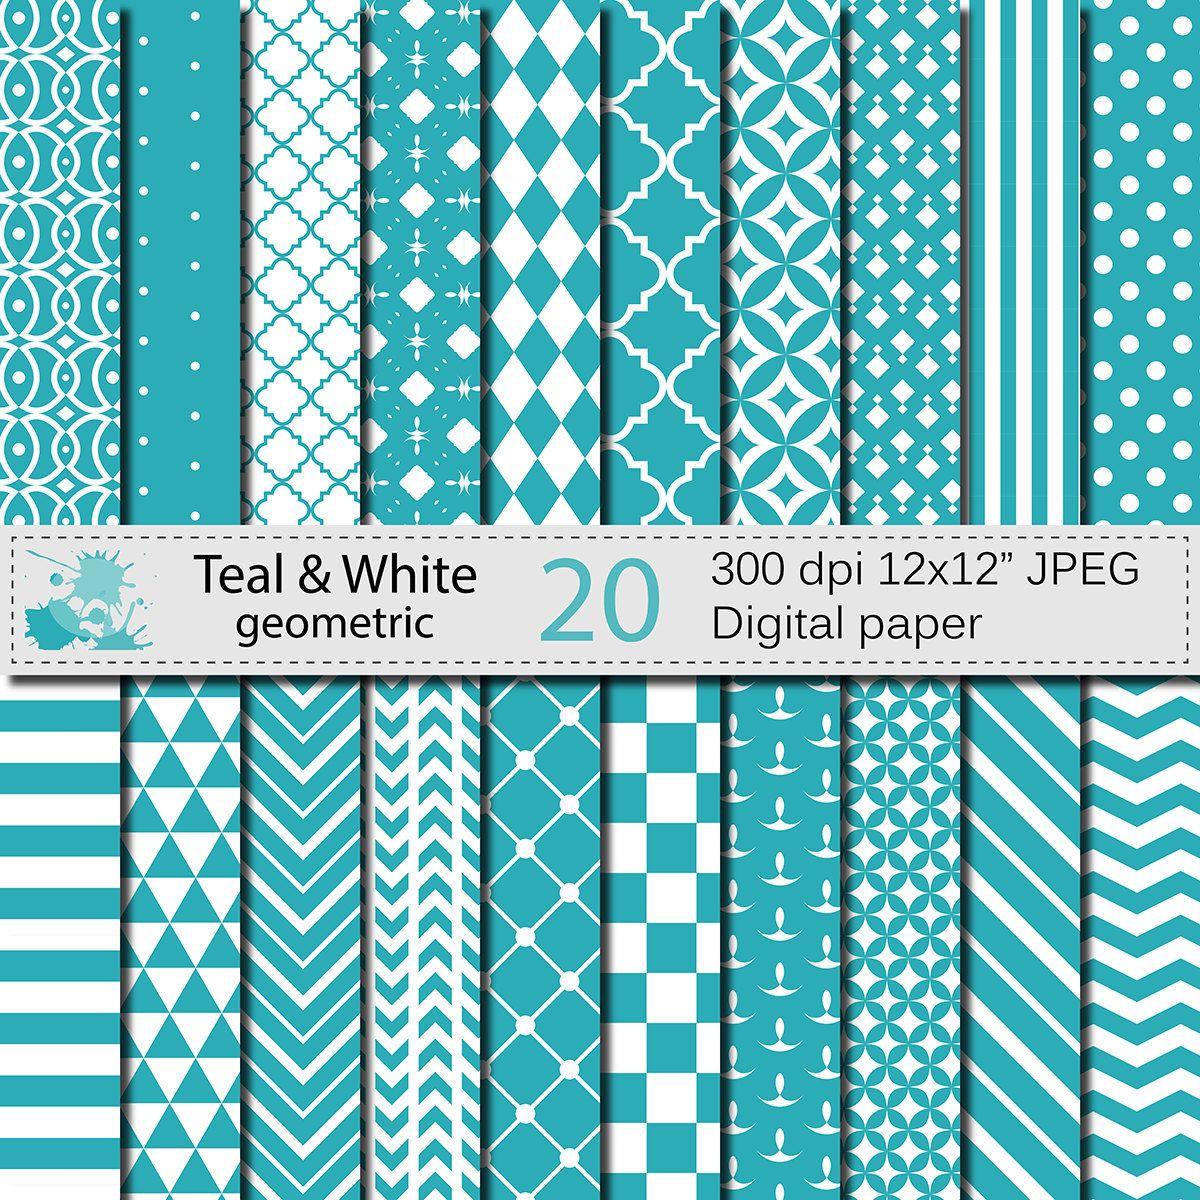 Teal and White Geometric Digital Paper Set, Geometric Digital papers, Teal White Scrapbooking papers, Instant Digital Download by VRDigitalDesign on Etsy